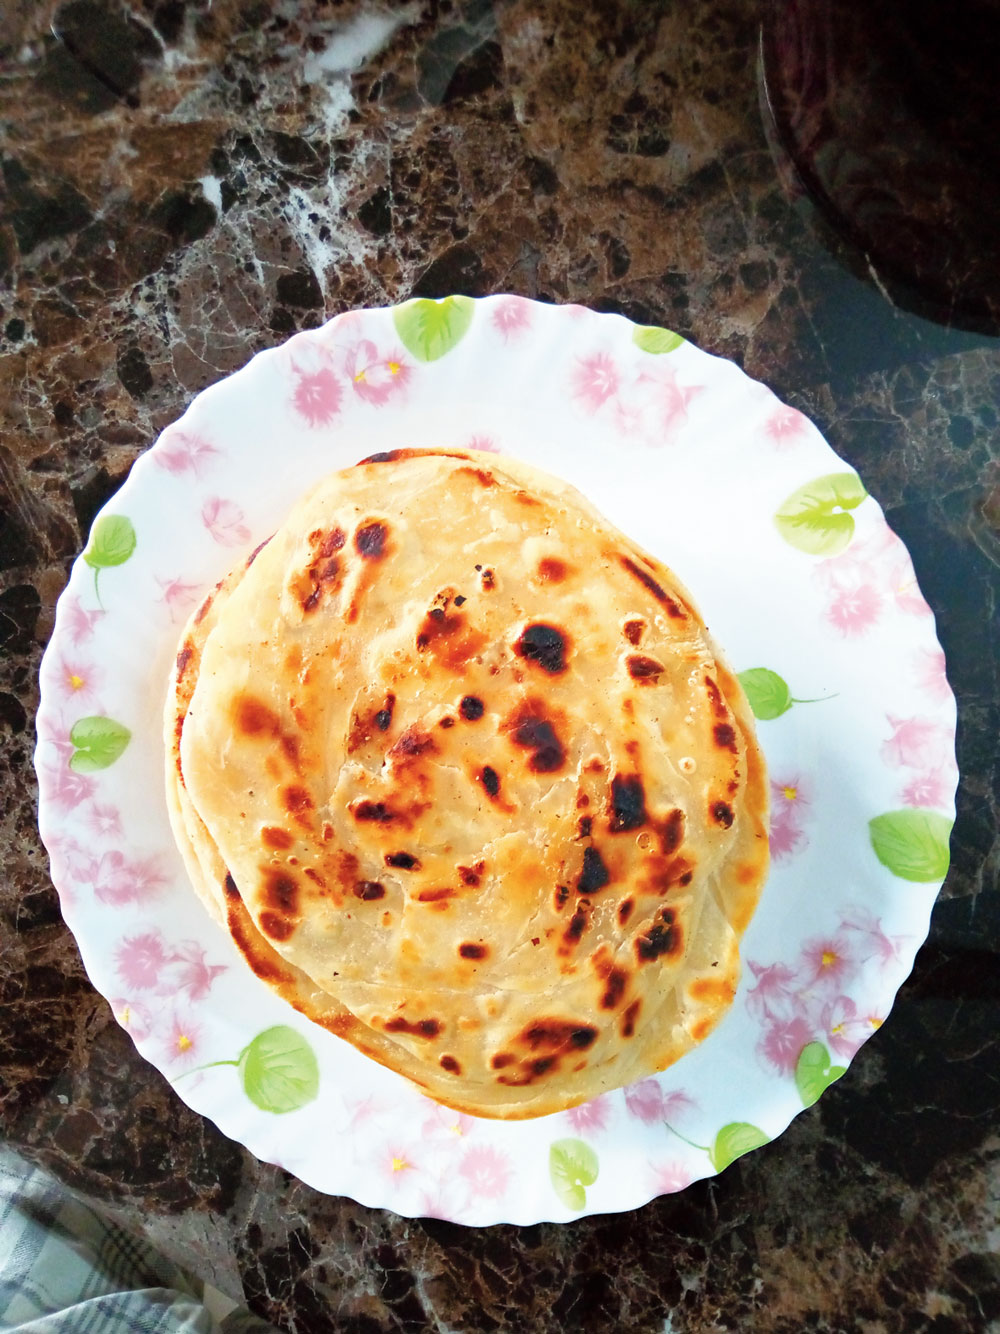 Crispy lacha pratha